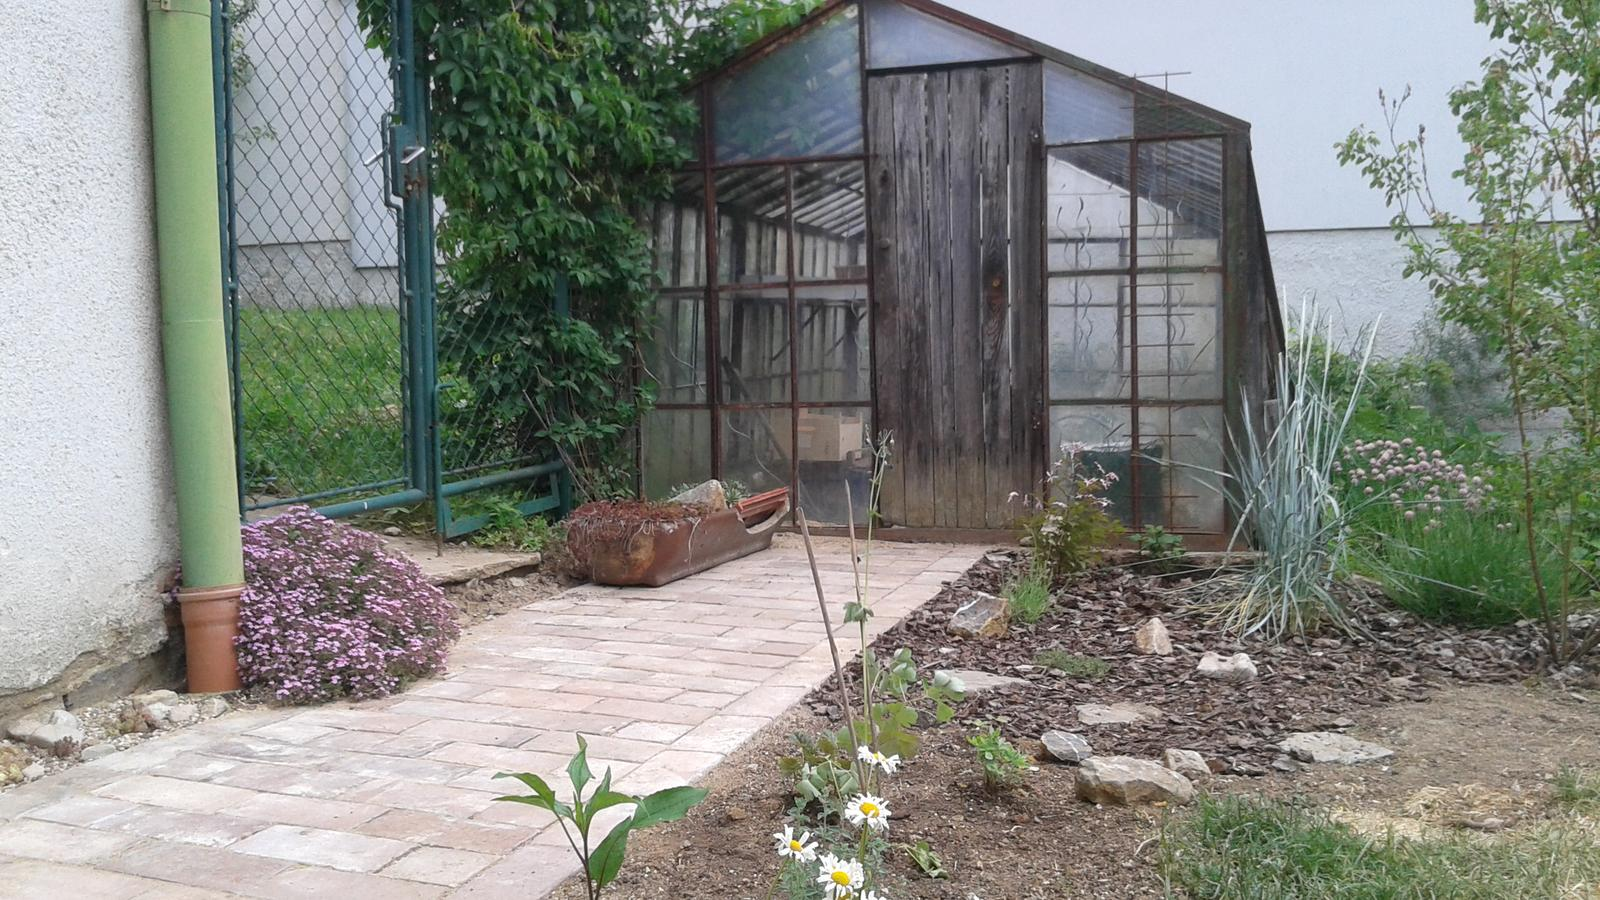 Zahrada od začátku - po 14 dnech už to vypadalo veseleji :-)